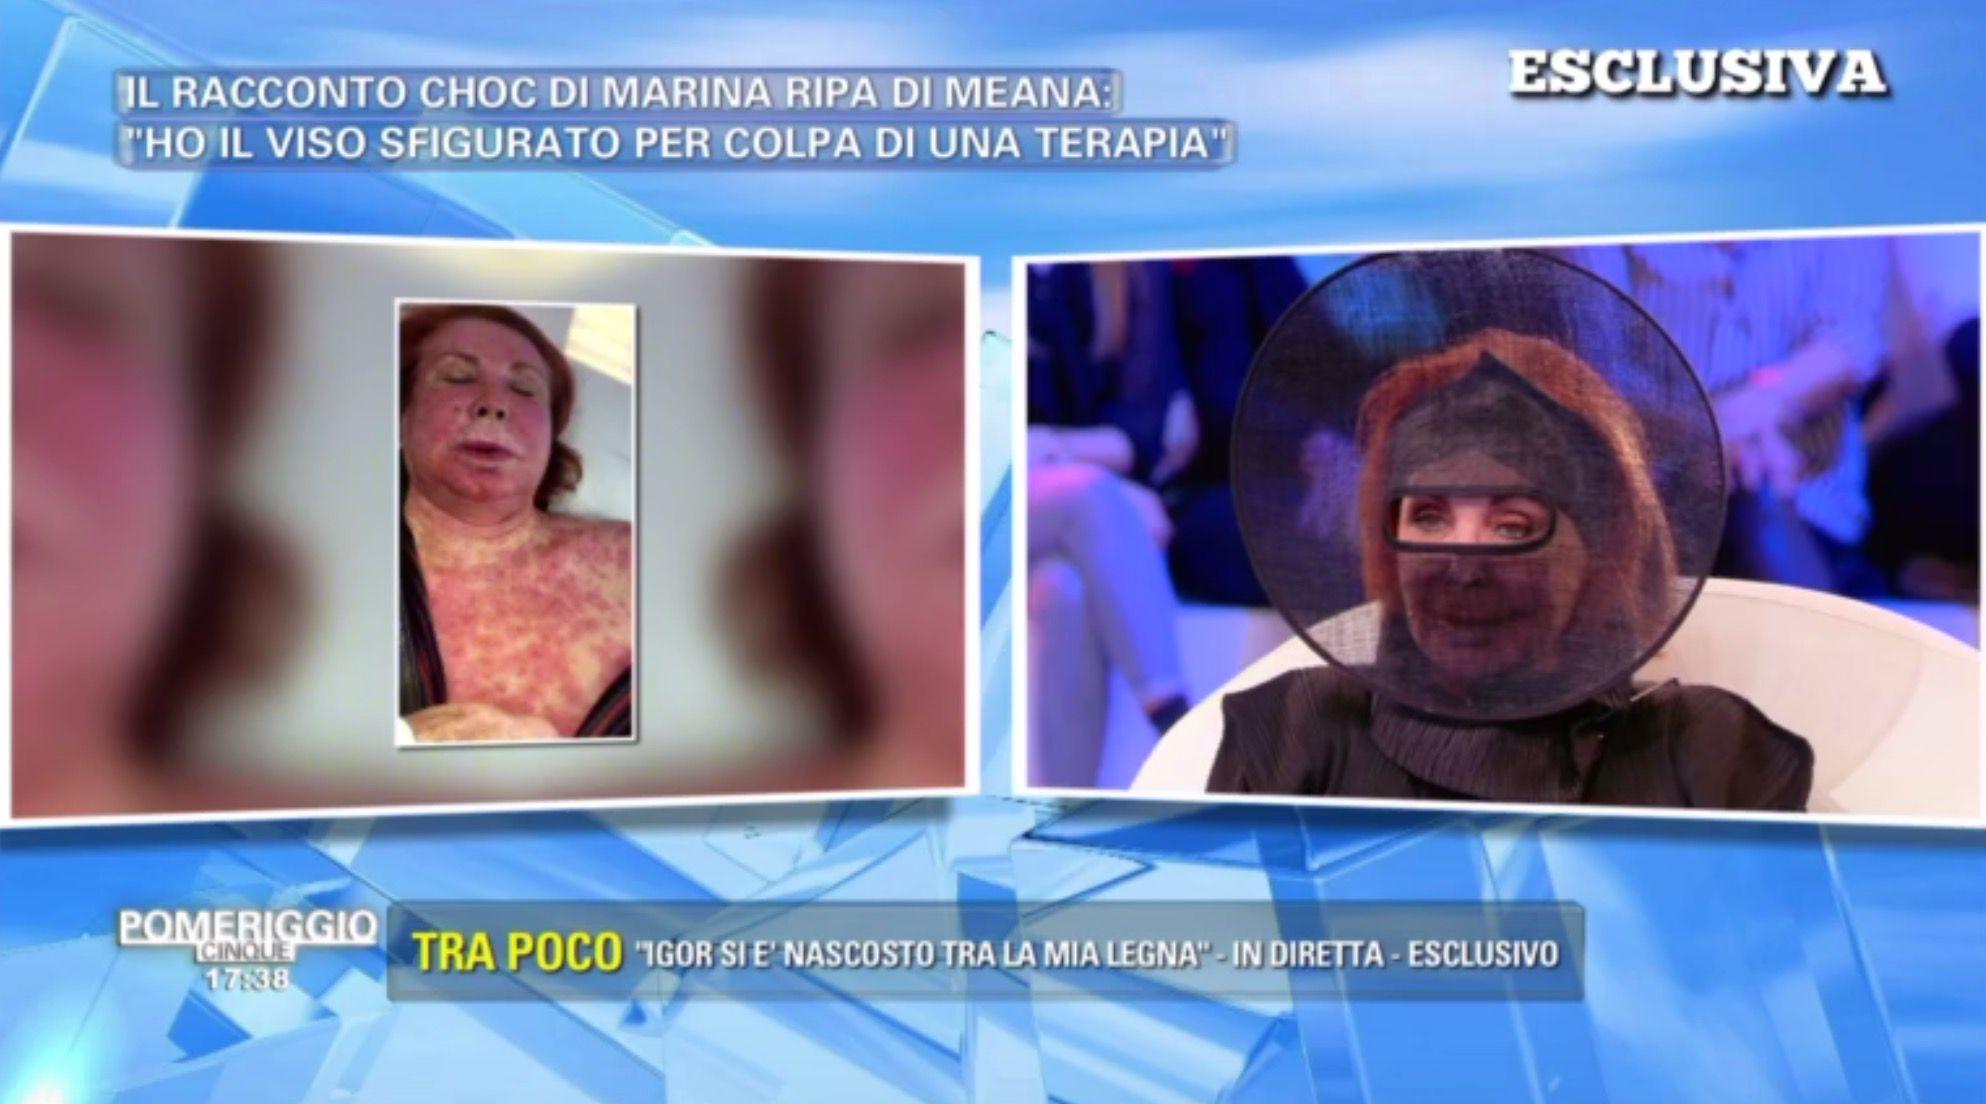 Marina Ripa di Meana irriconoscibile: